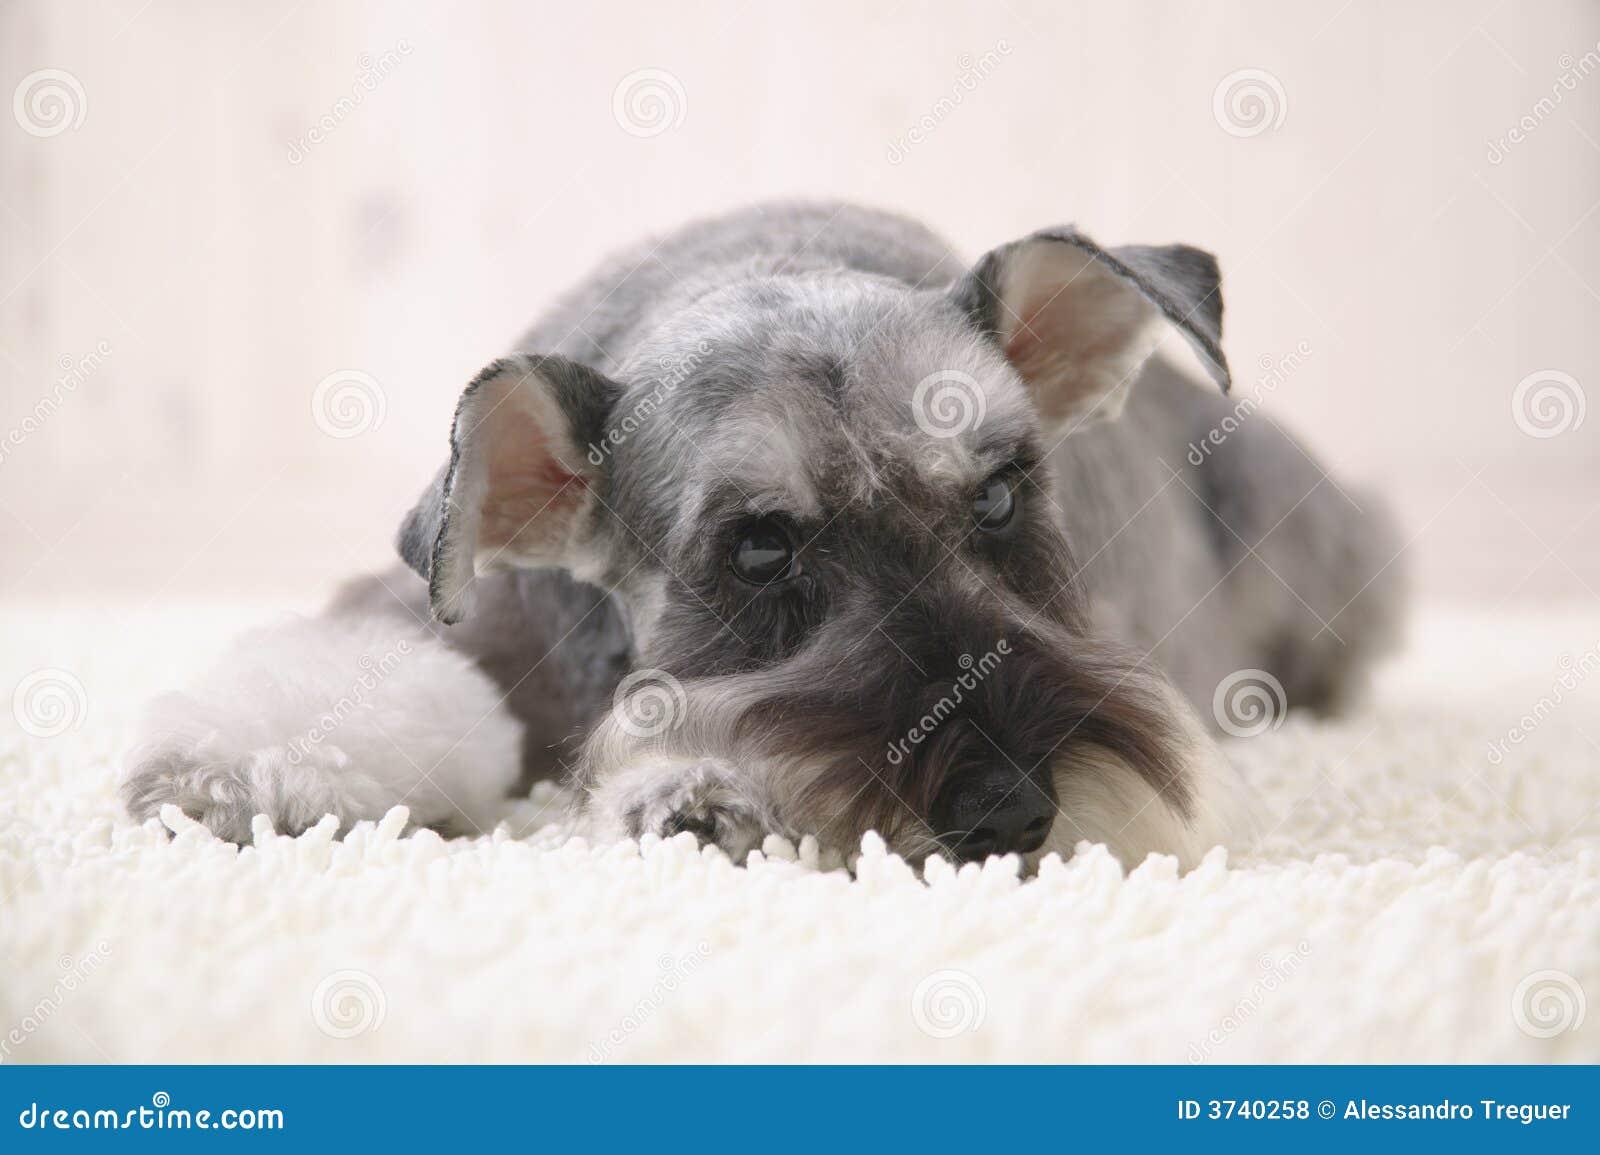 Schnauzer Dog On The White Carpet Royalty Free Stock